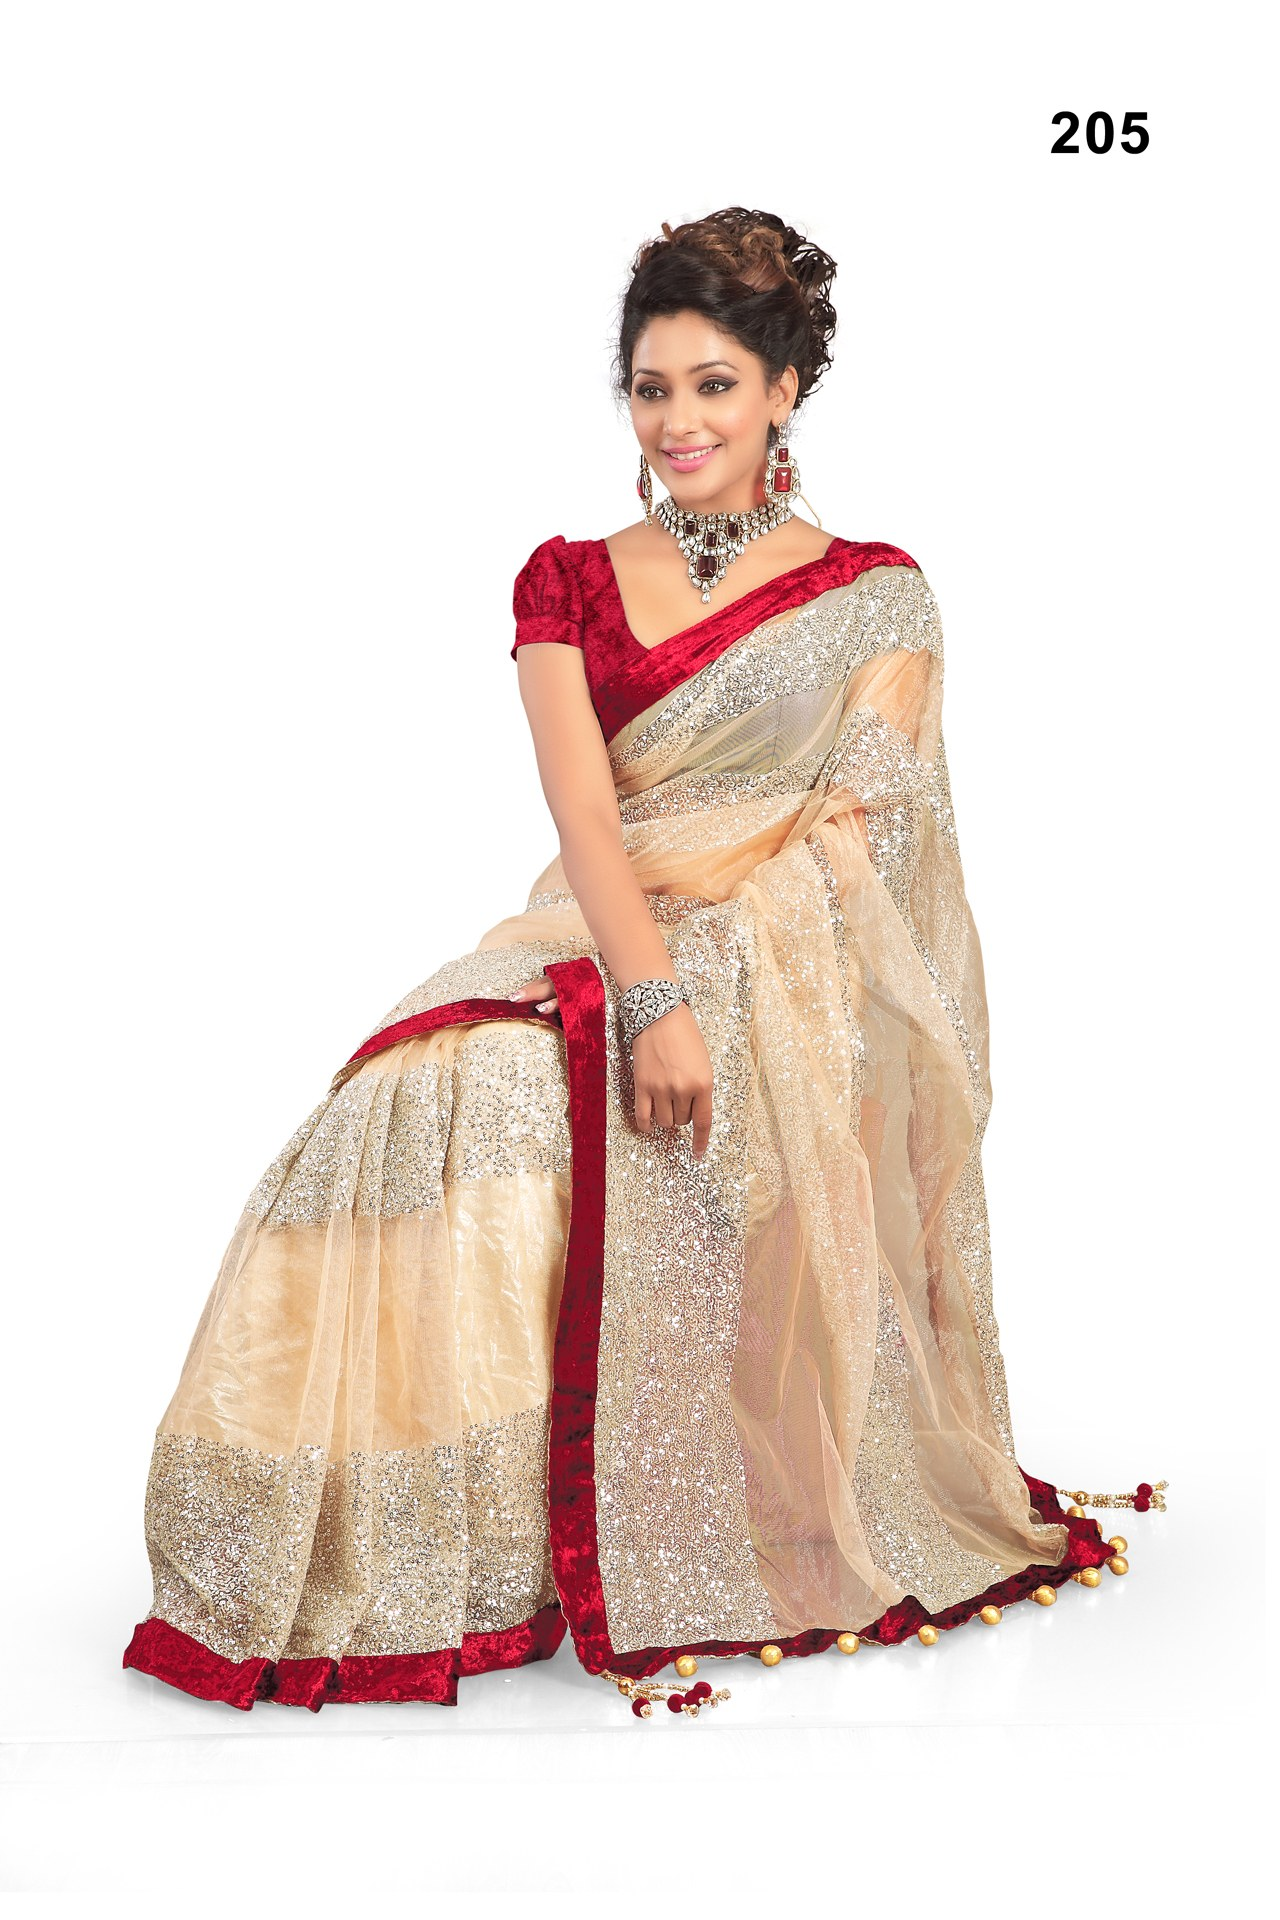 priyanka chopra wearing saree - photo #22